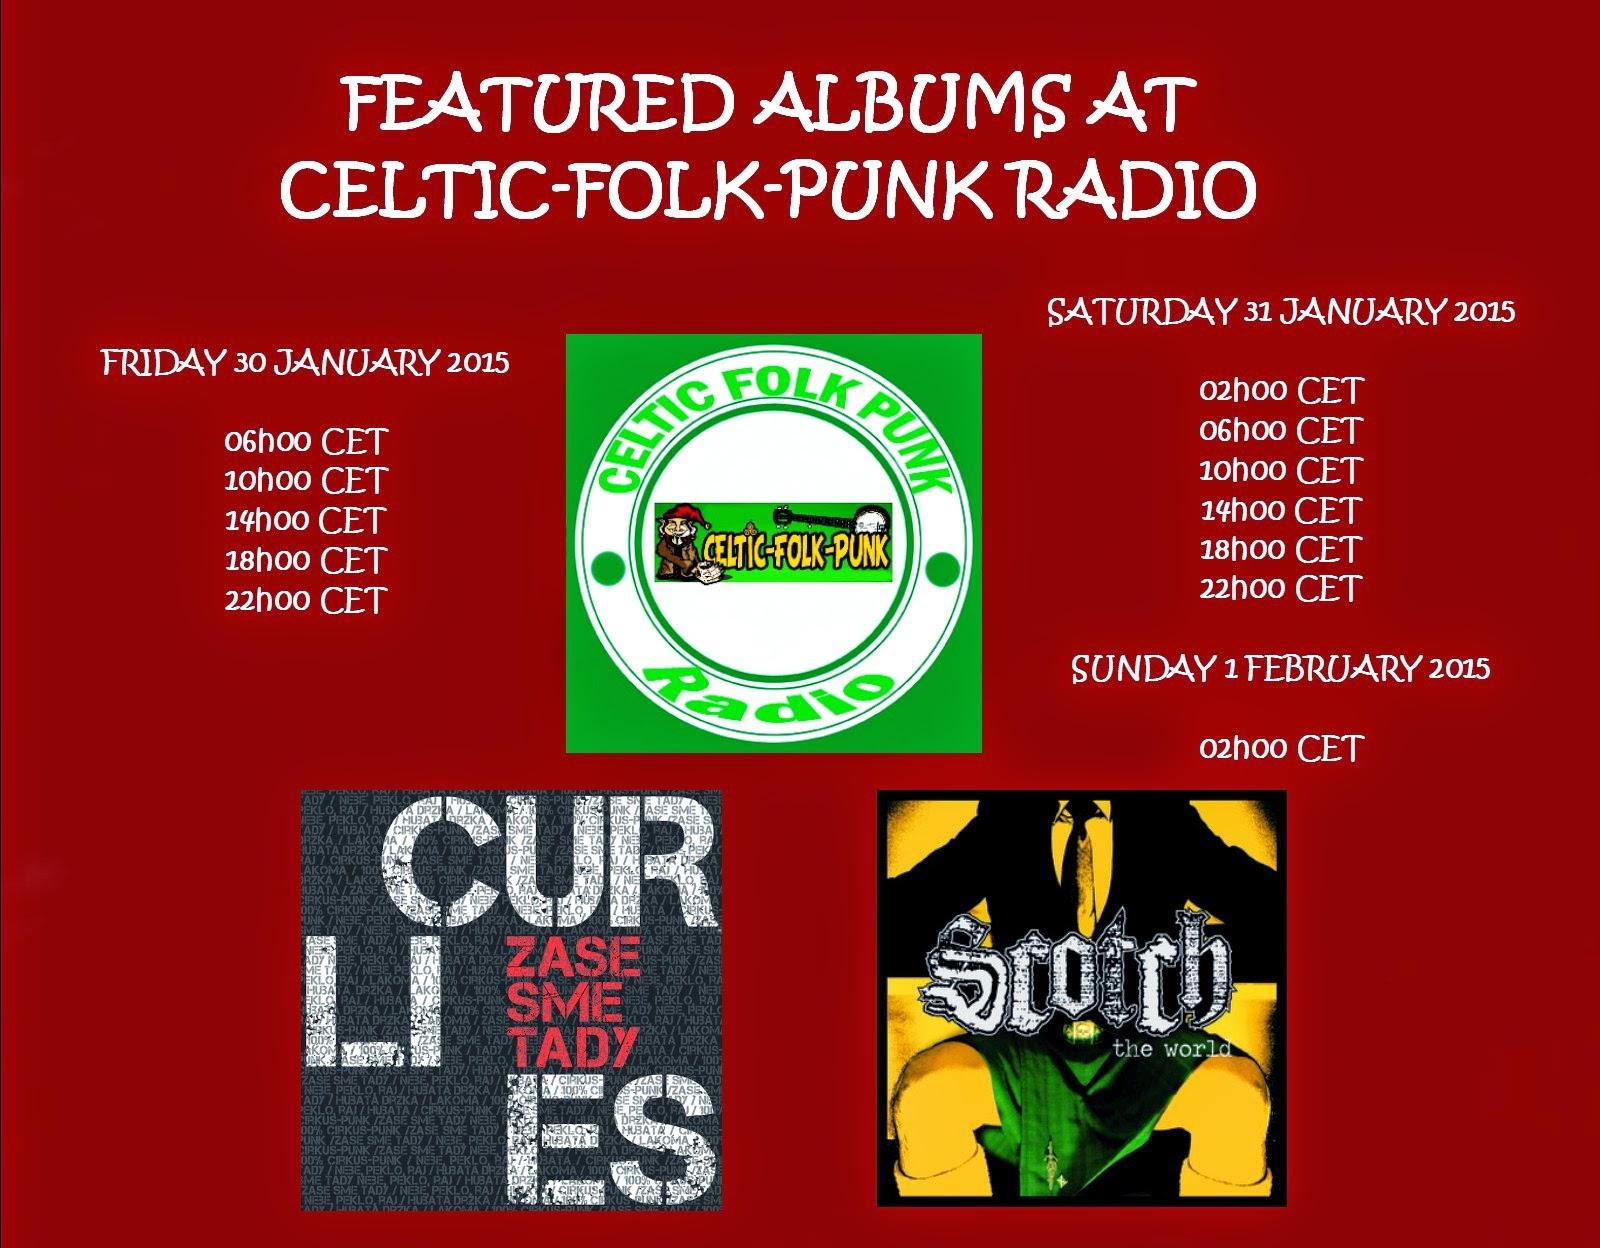 FEATURED CDs AT CELTIC FOLK PUNK RADIO (30-31 JANUARY 2015 ...